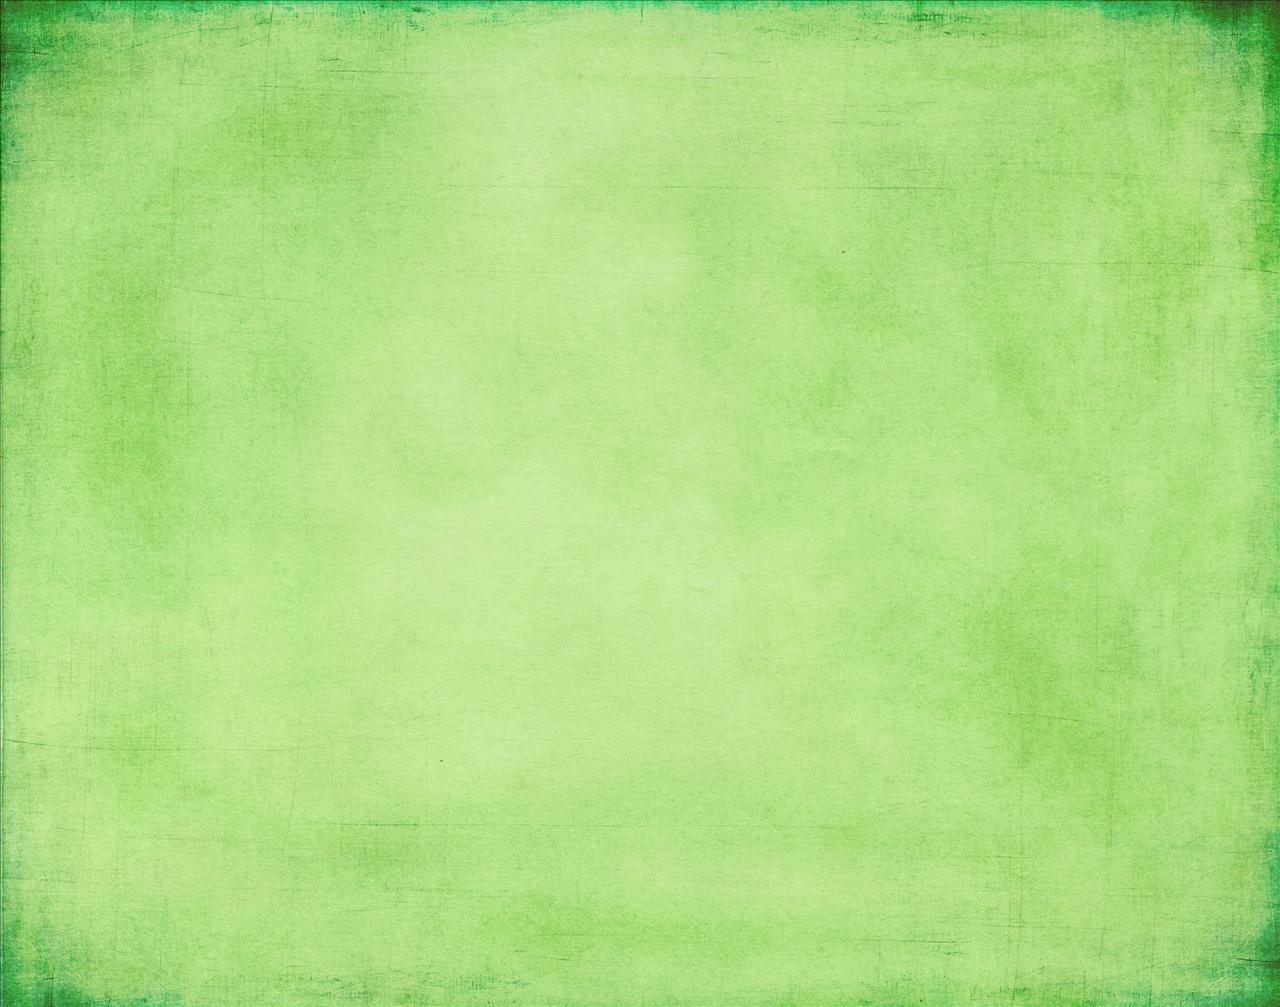 Watercolor Background In 2020 Watercolor Background Green